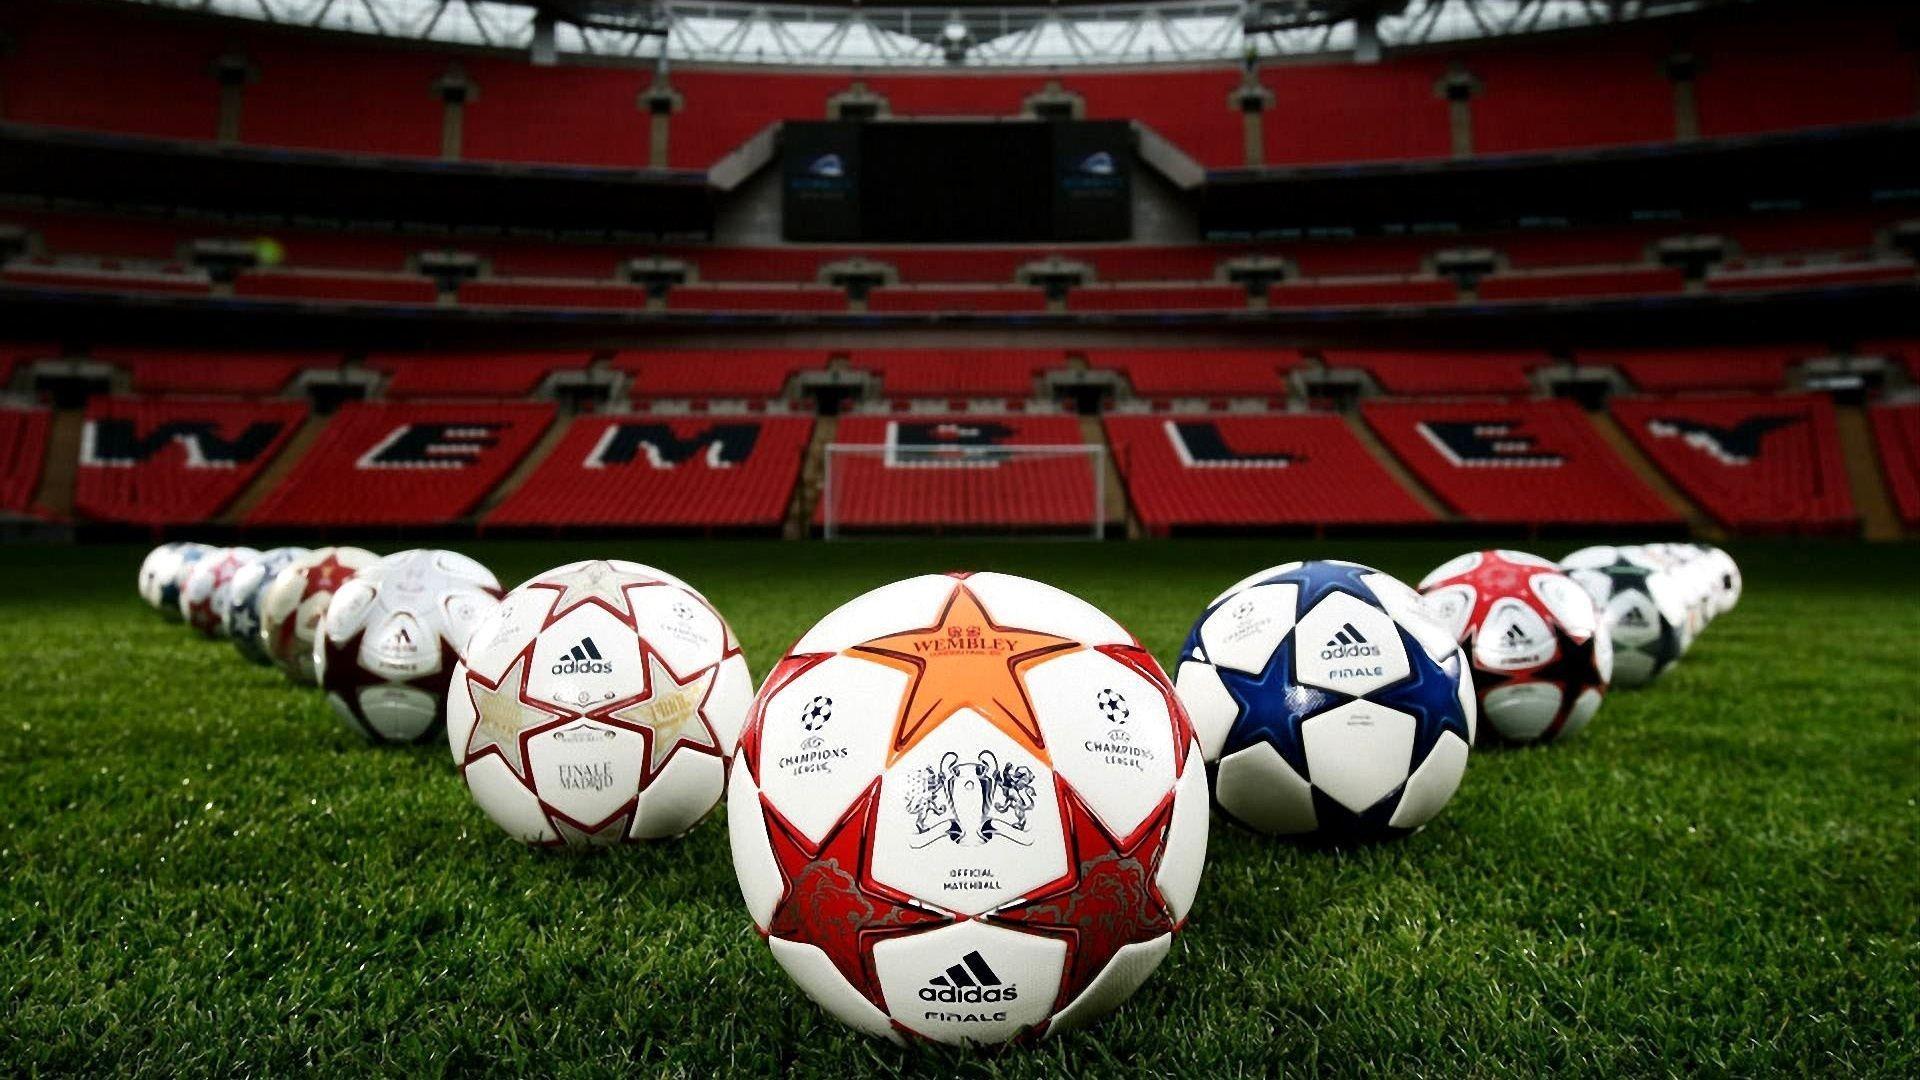 Download Free HD Wallpaper : Hd Soccer Wallpapers 1080p – Download .